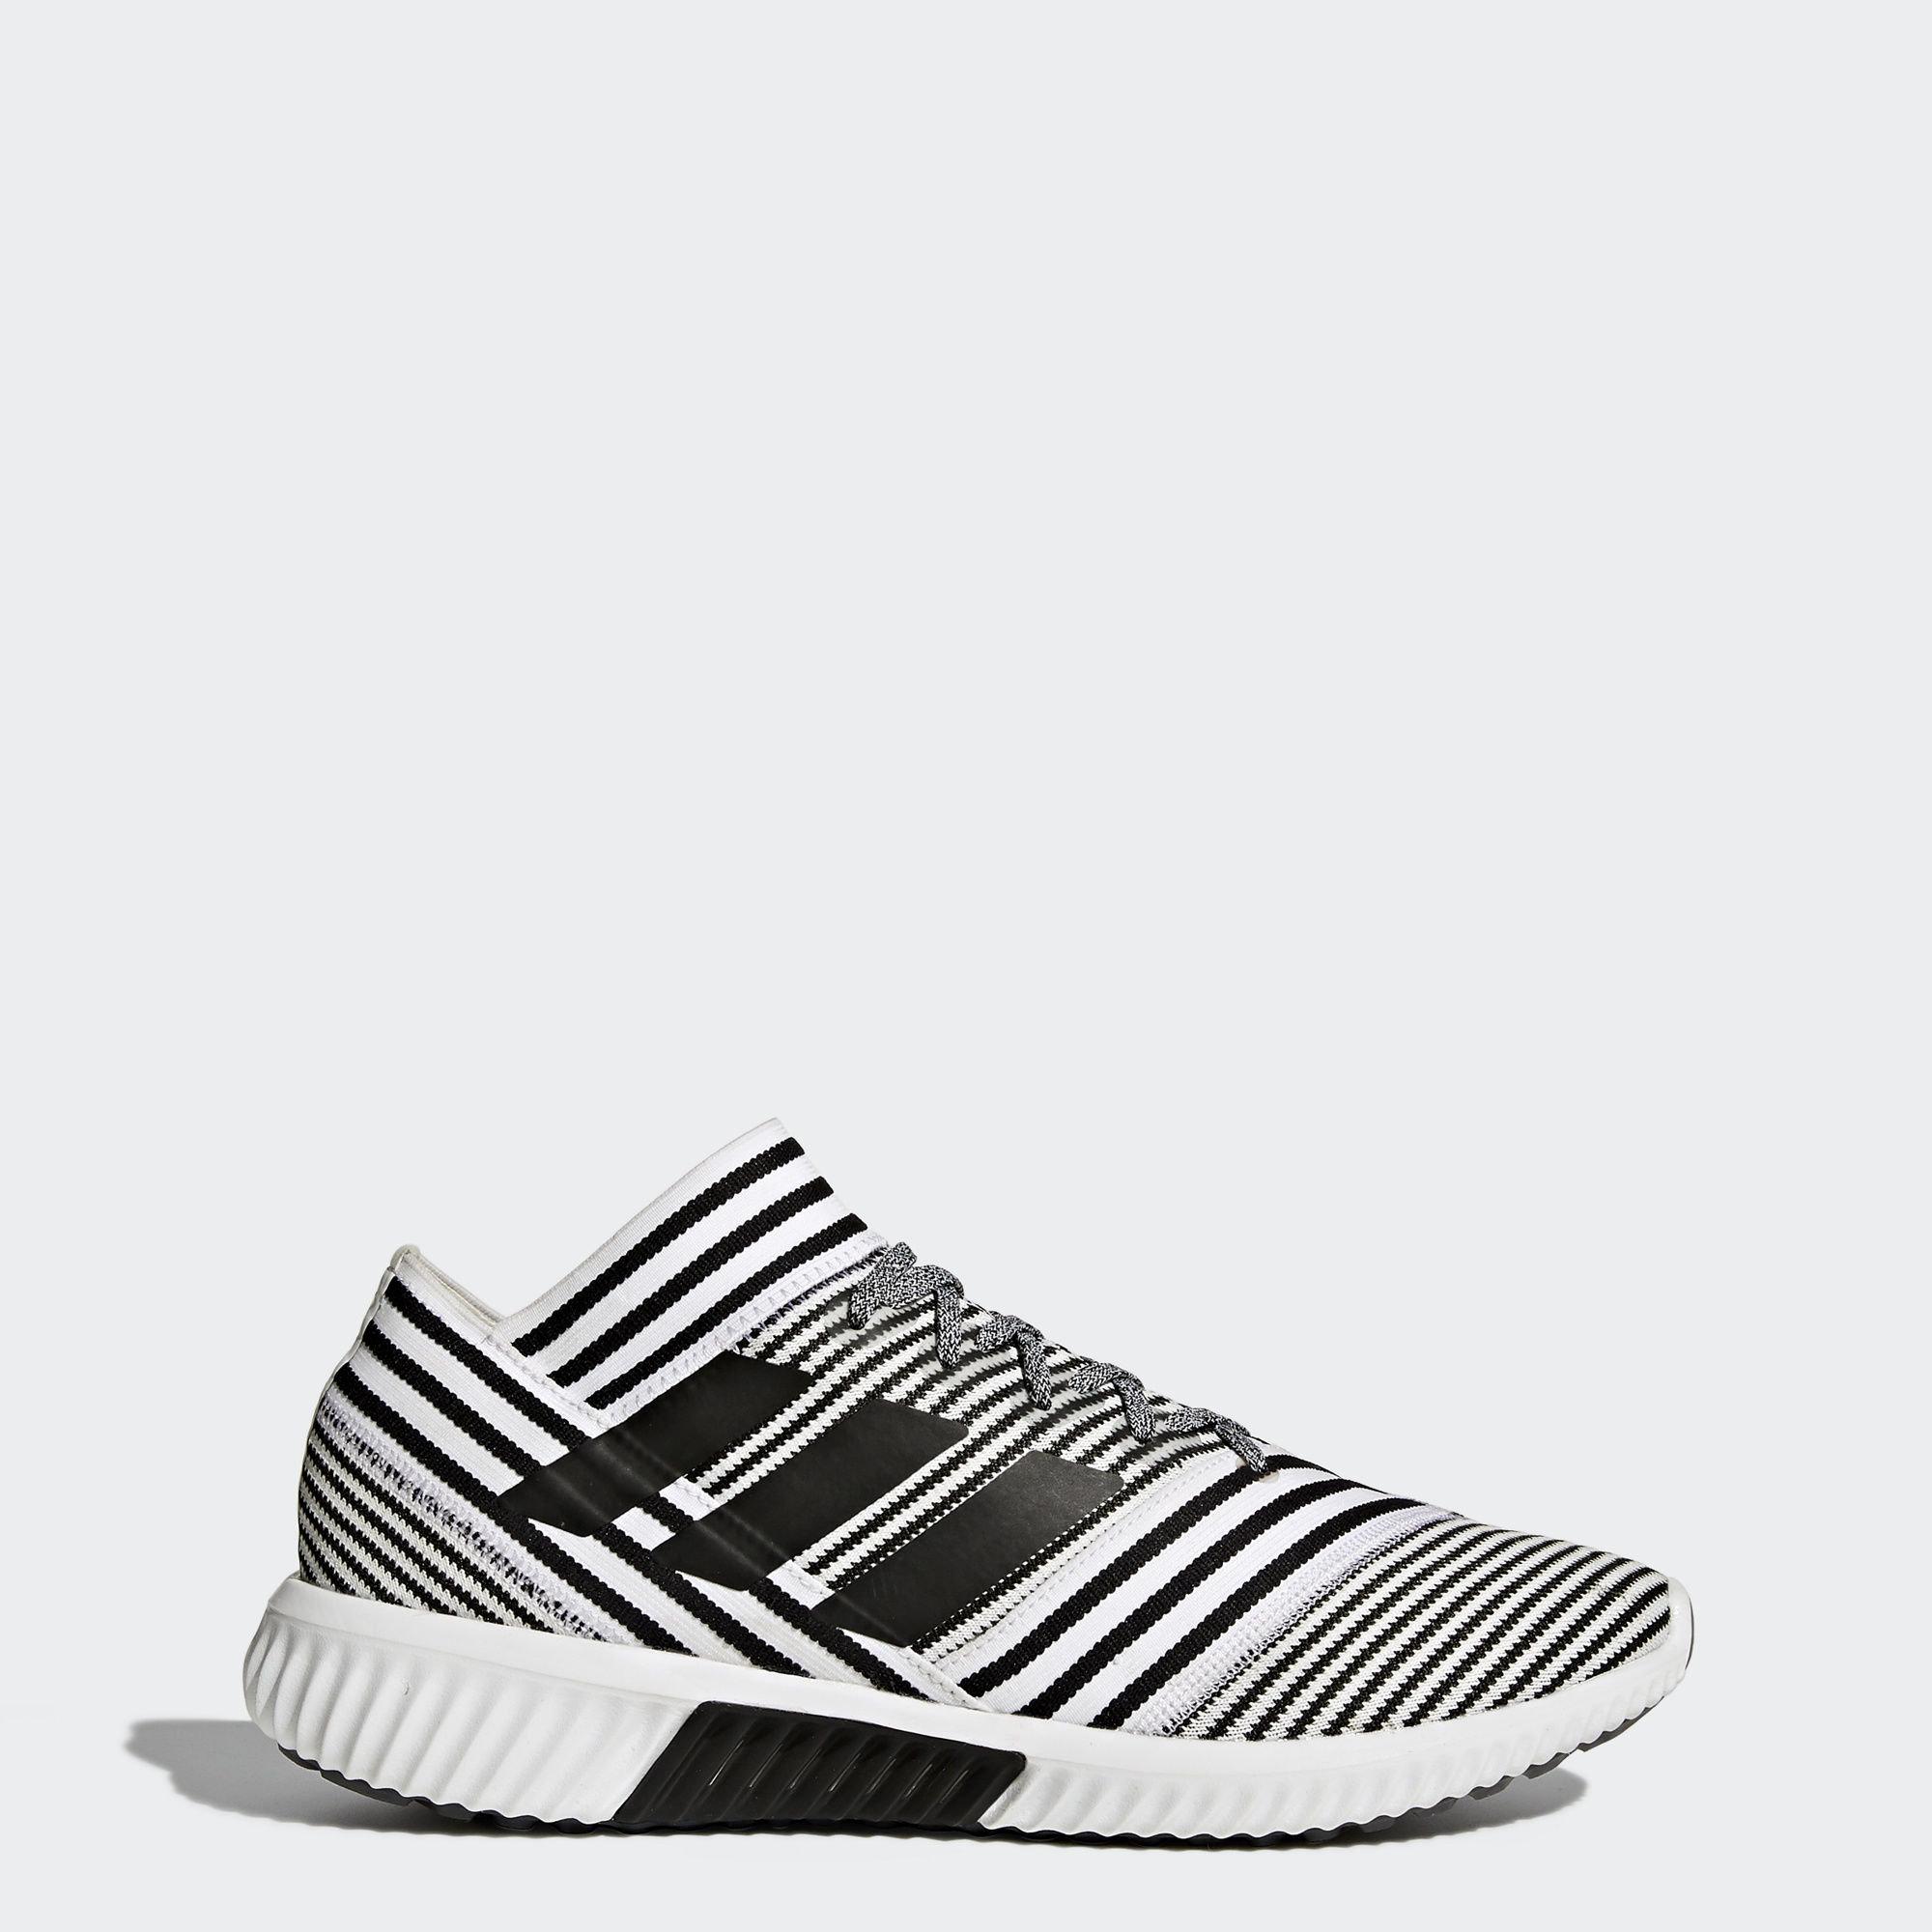 Футбольная обувь Nemeziz Tango 17.1 adidas Performance Footwear White/Core Black